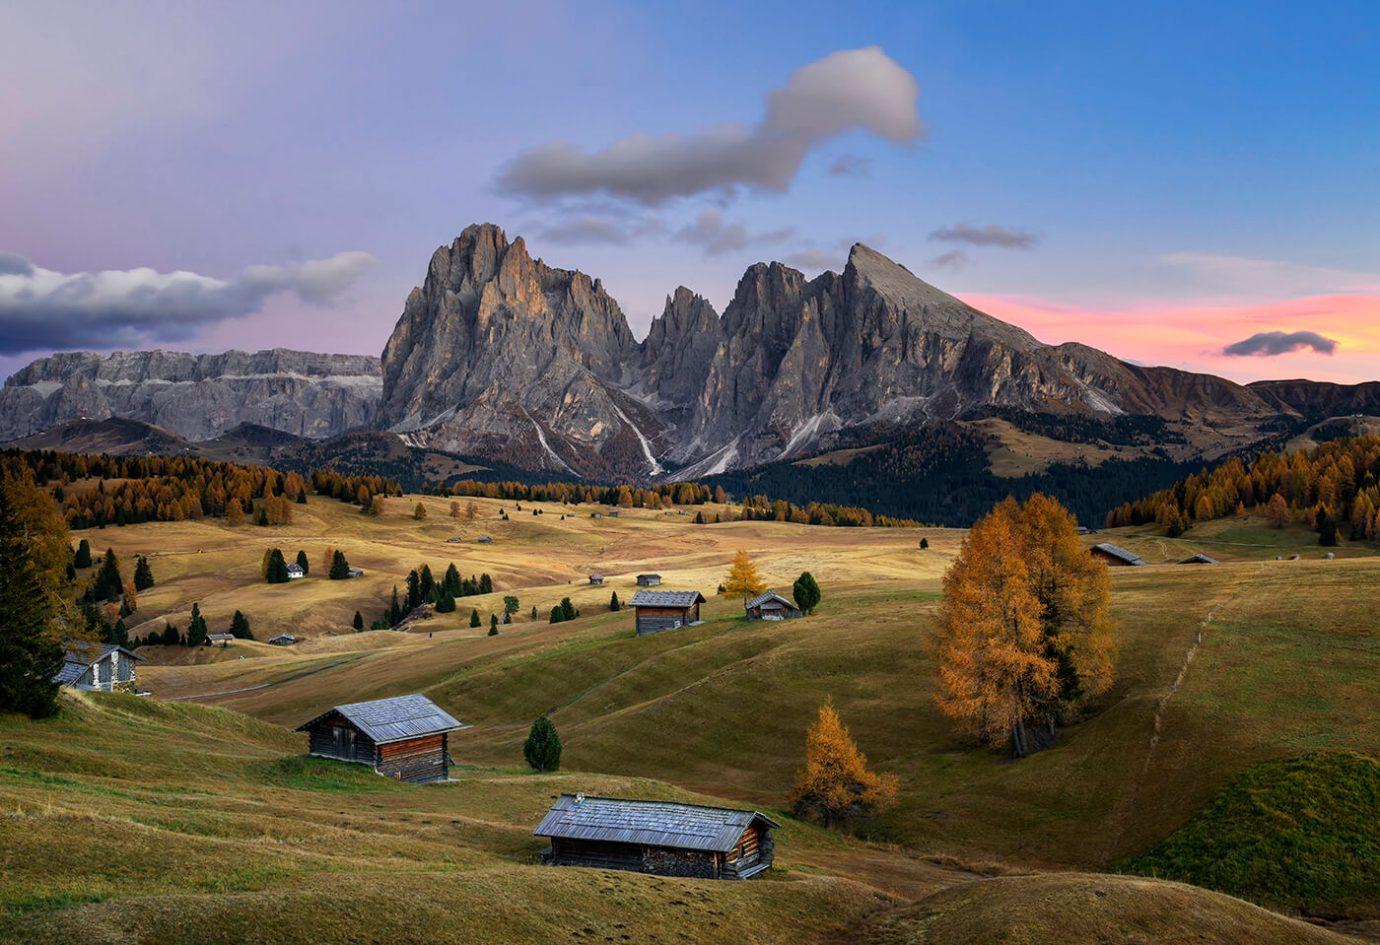 Sassolungo Range, Alpe di Siusi, Dolomites, Italy, Melvin Nicholson Photography